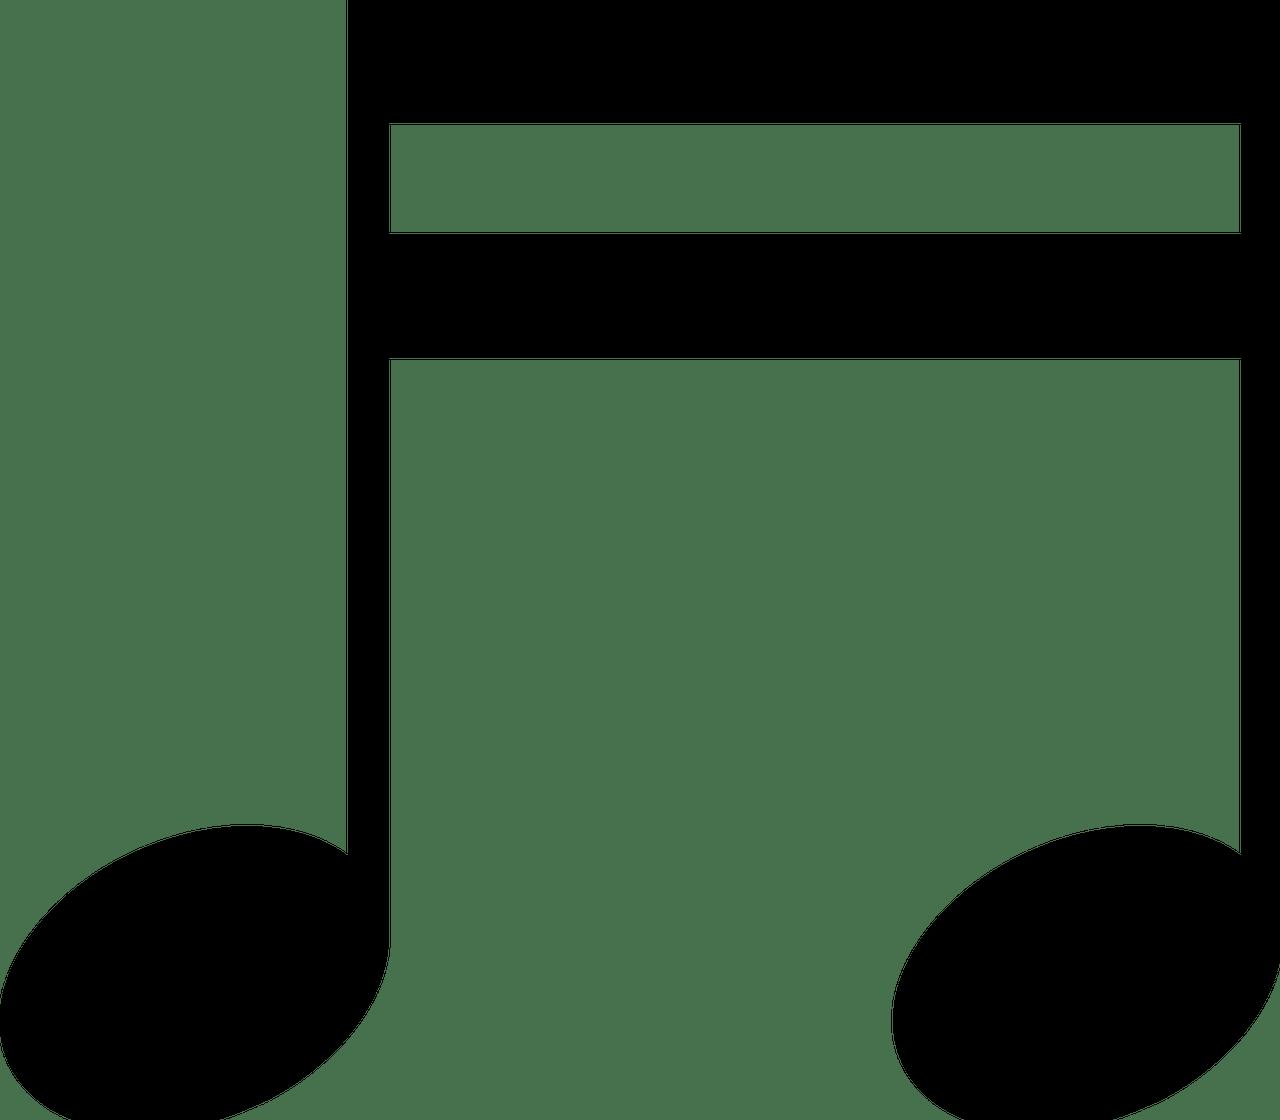 Symbols transparent png images. Clipart music music symbol